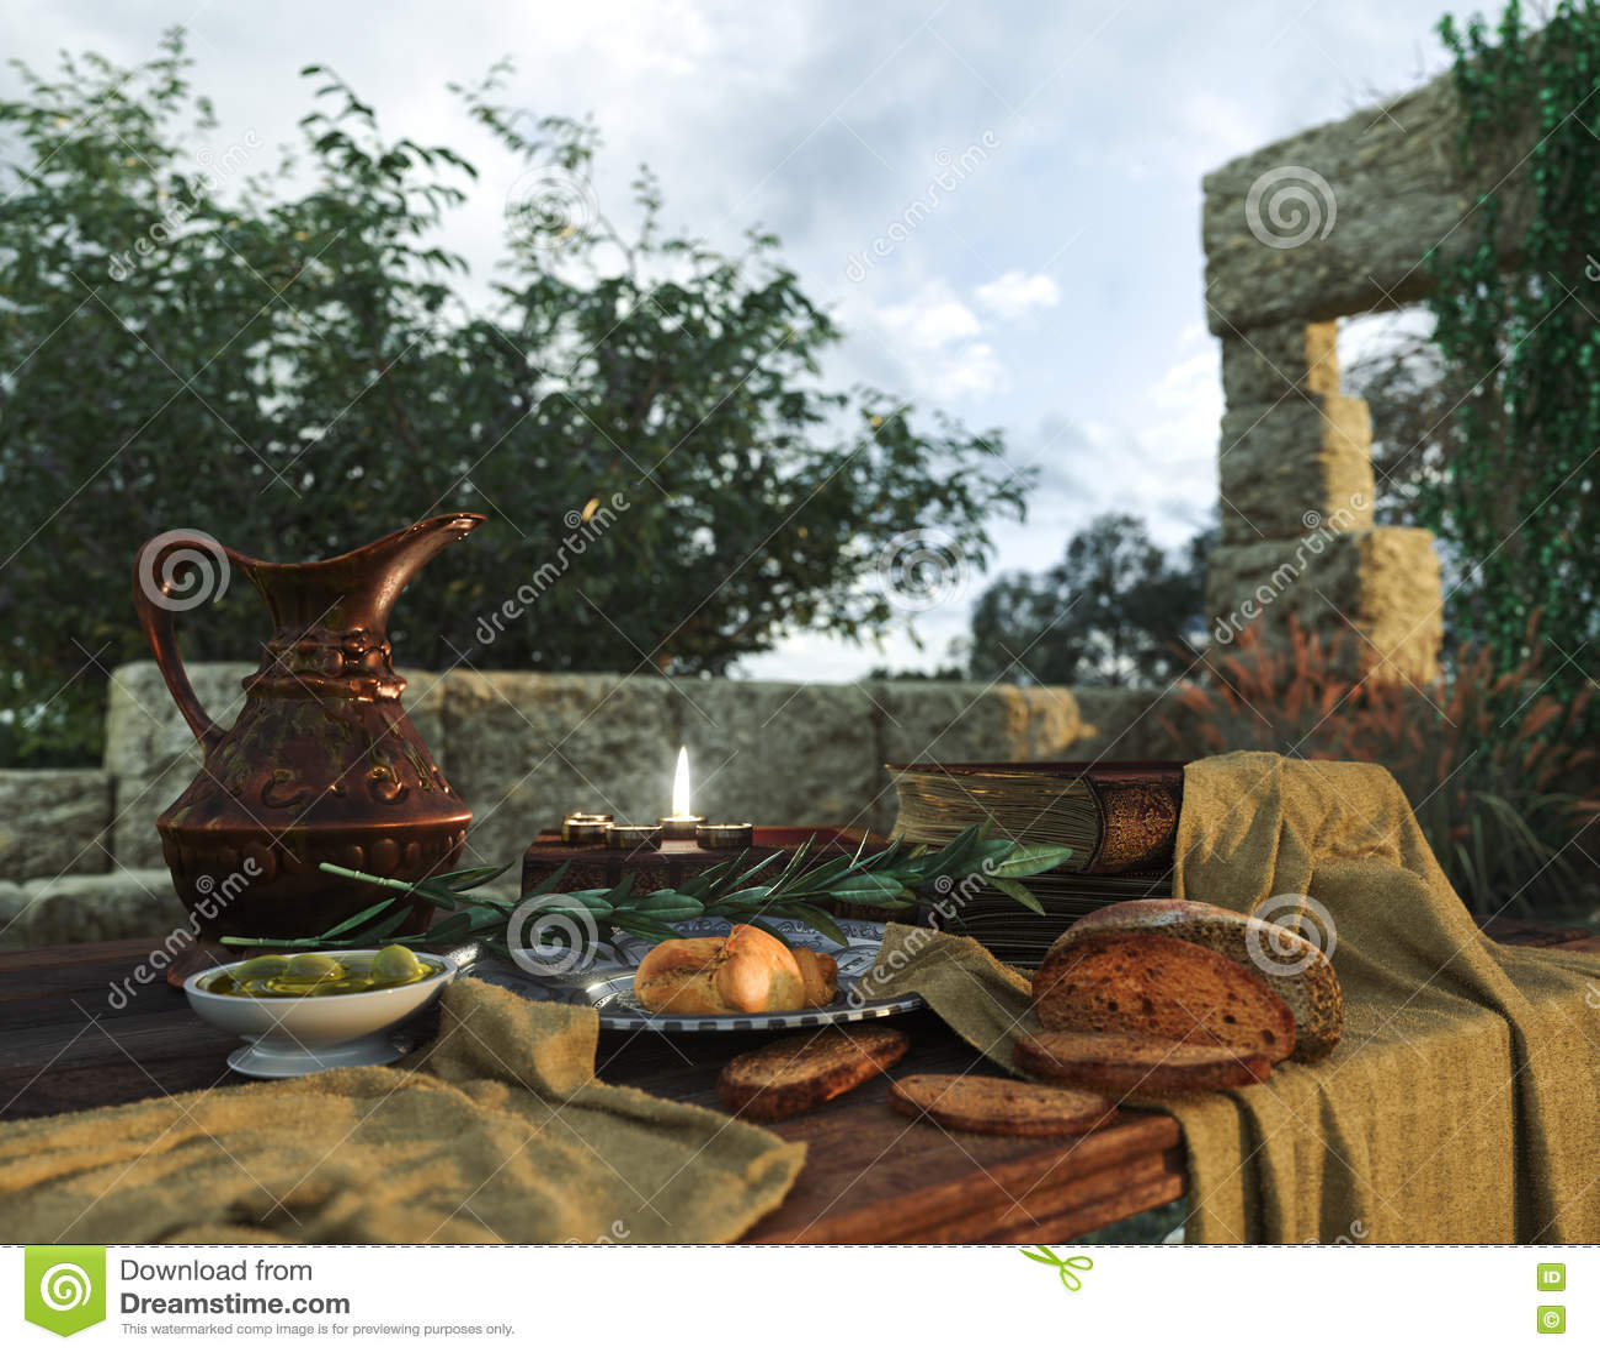 Stilllife με τις αρχαίες καταστροφές, τα βιβλία, την ελιά και τη στάμνα